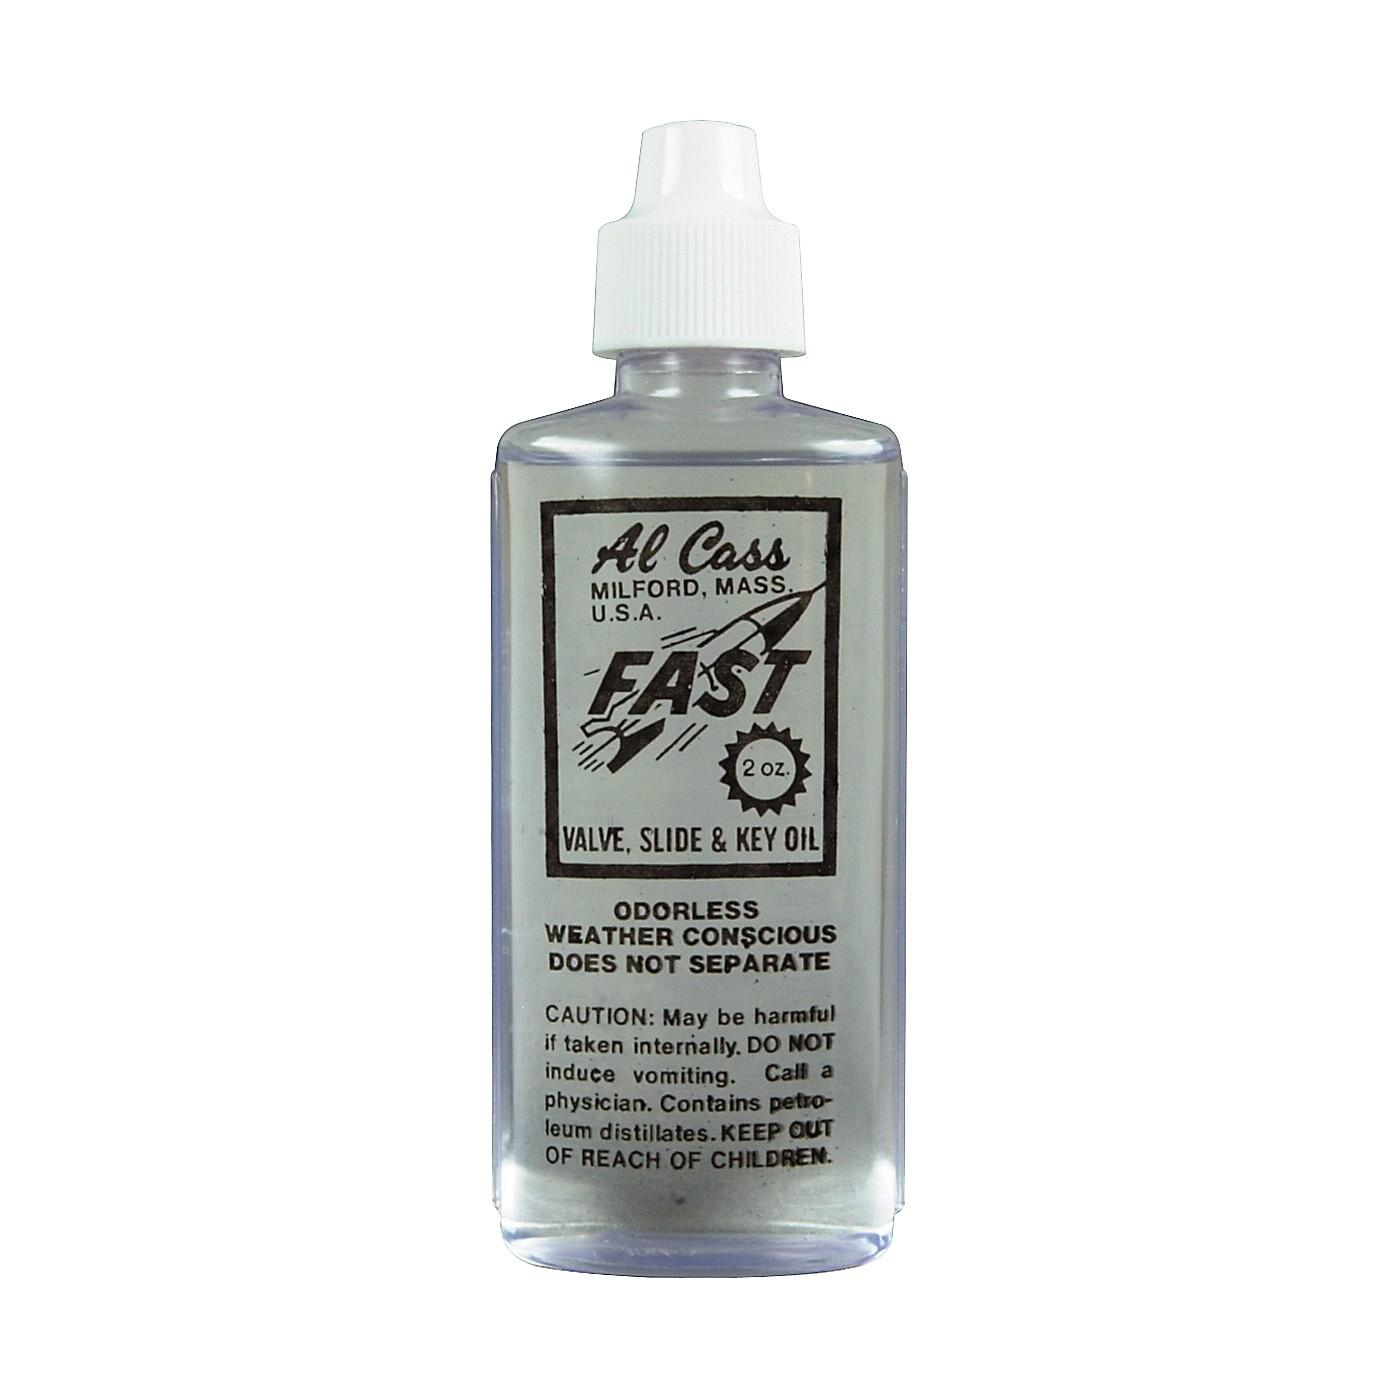 Al Cass Fast Valve, Slide and Key Oil thumbnail